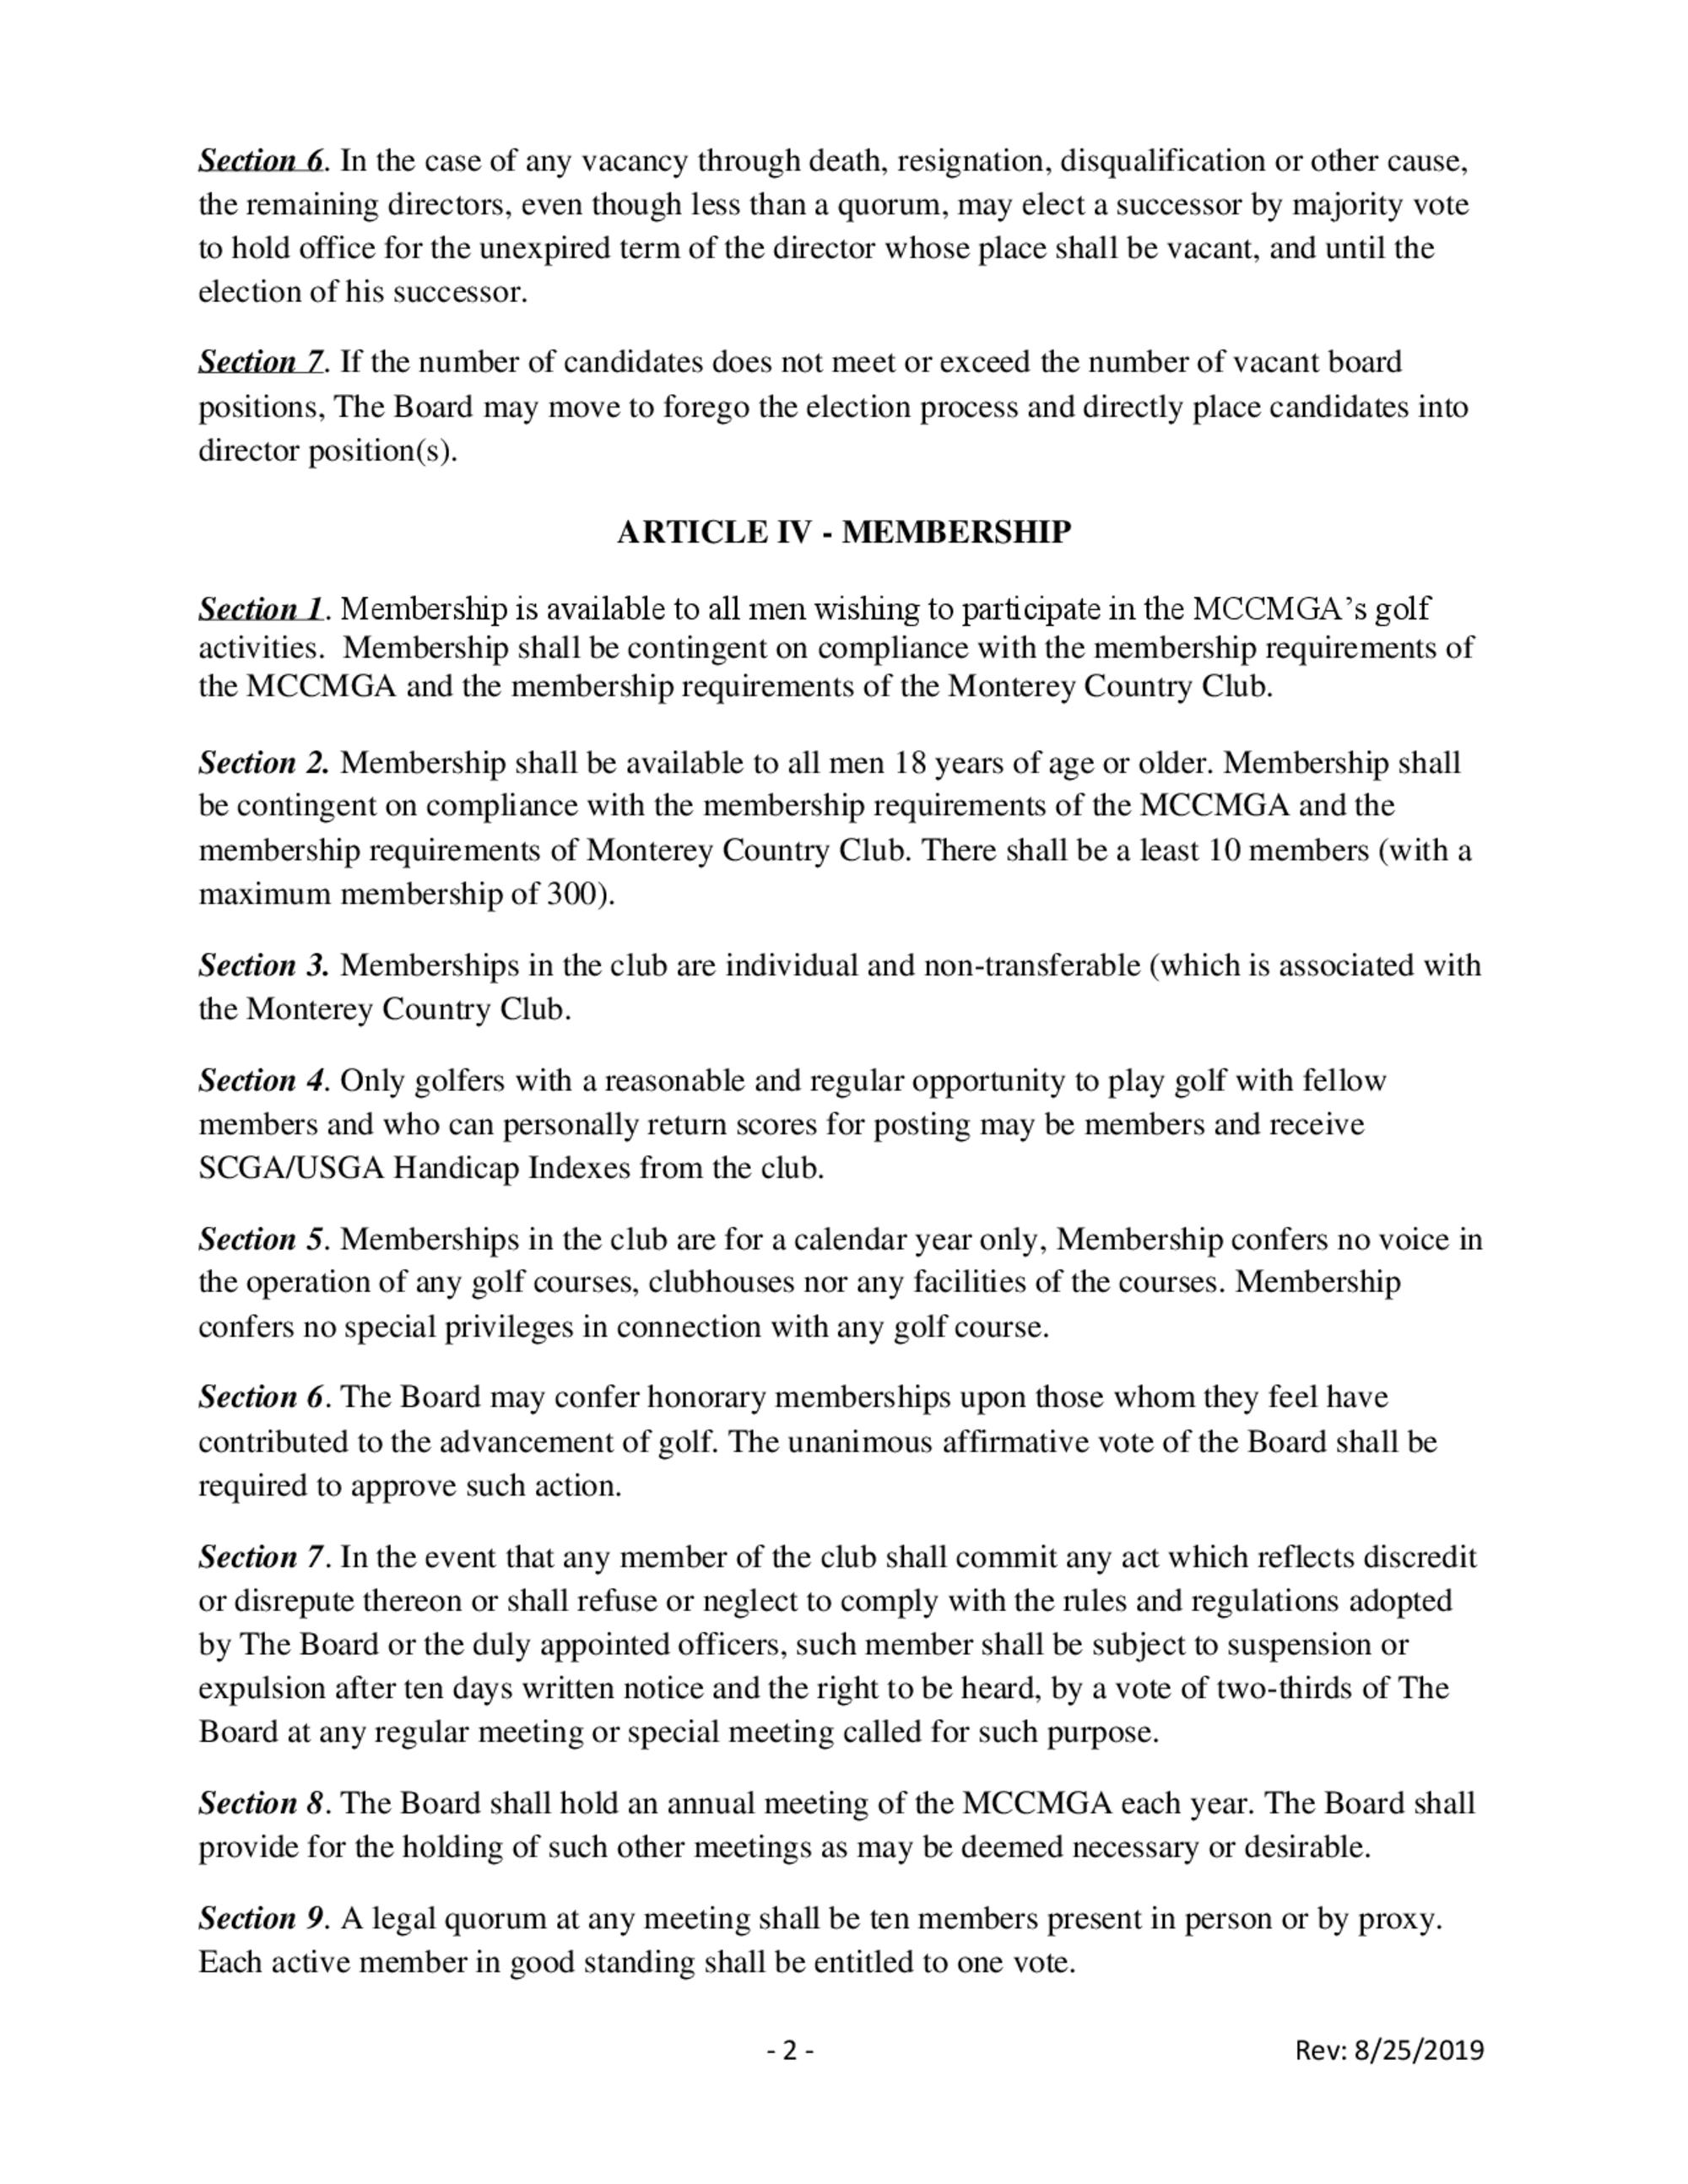 Mcc bylaws final 2